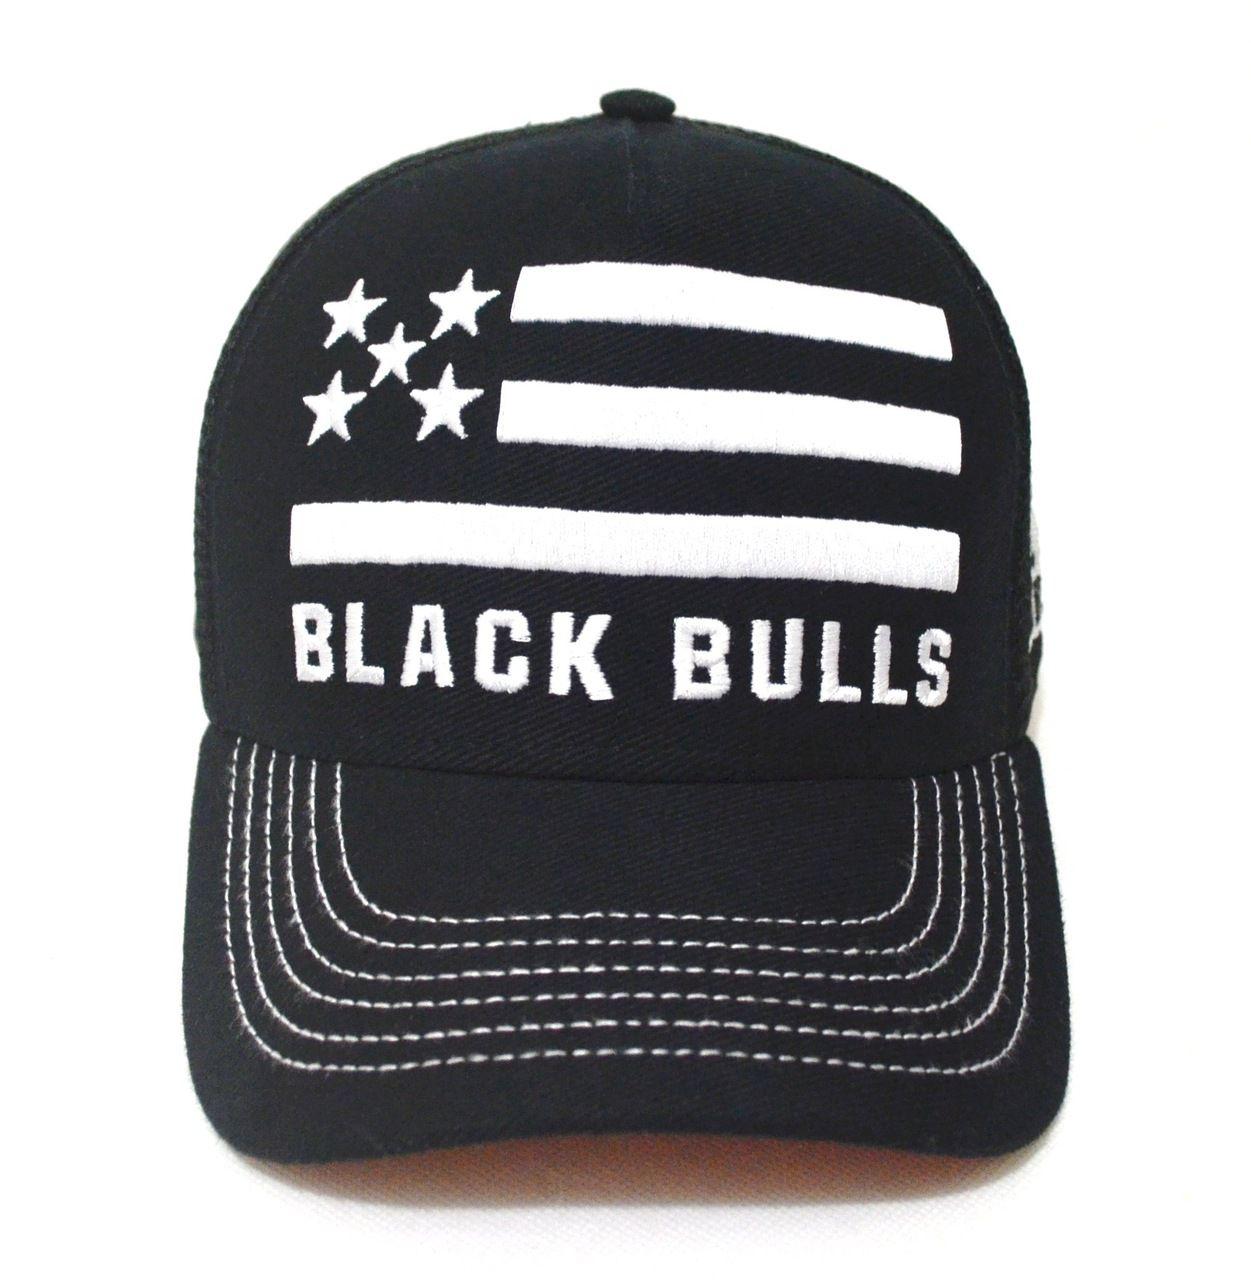 0e958493a8519 Boné Country Preto Bandeira Americana Aba Curva Black Bulls